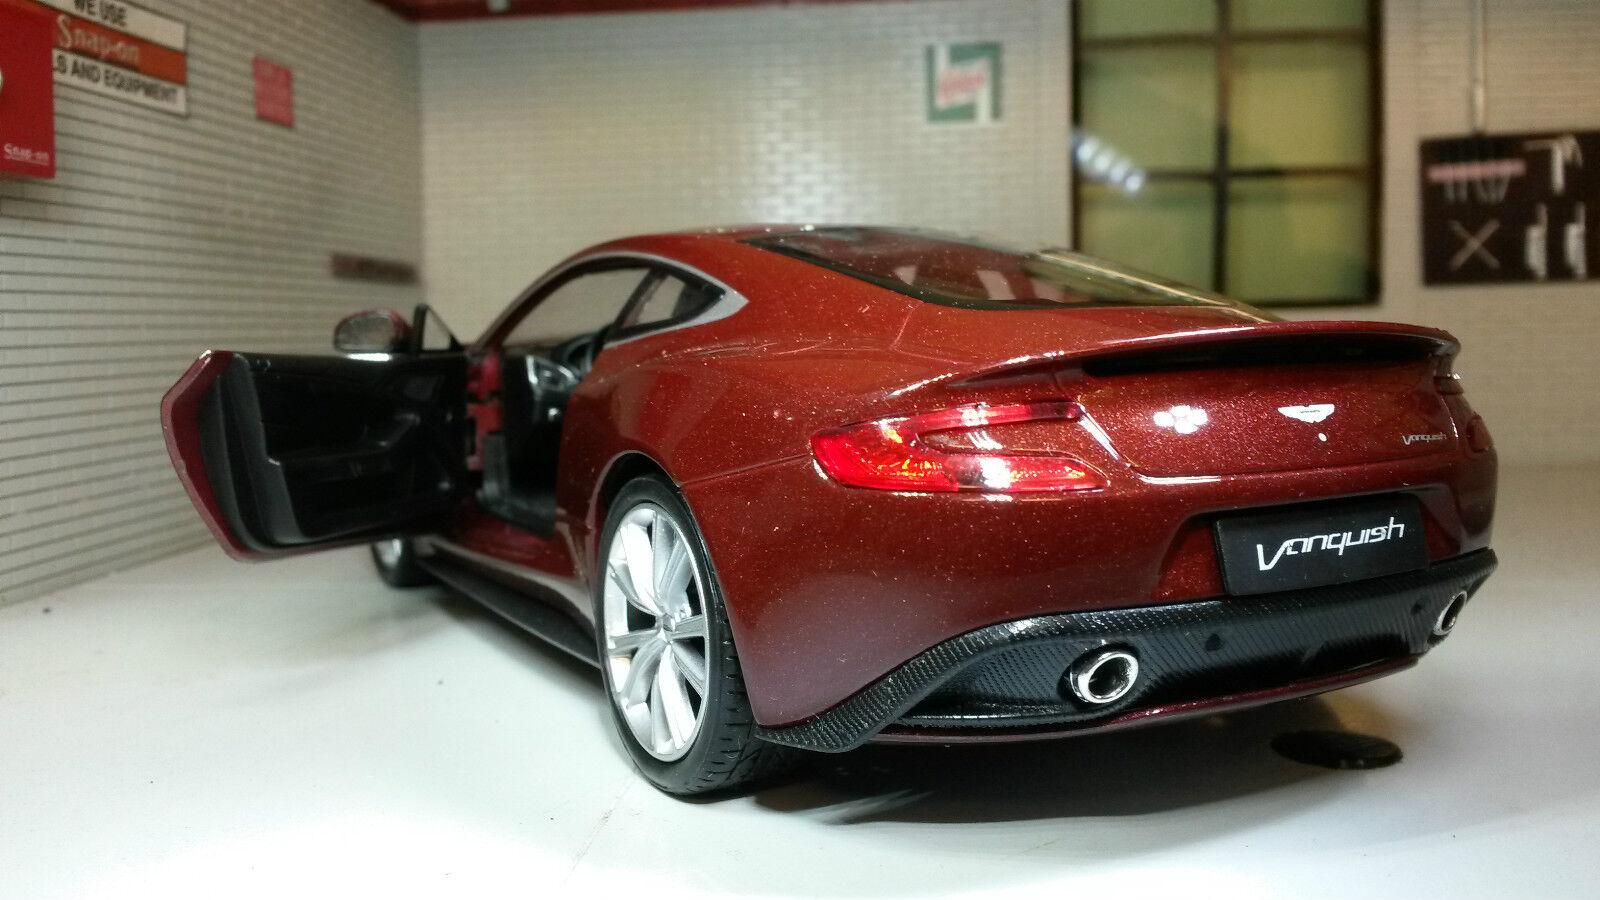 LGB 1 24 Scale Red Aston Martin Bond Vanquish 24046 24046 24046 V Detailed Welly Model Car 54e809